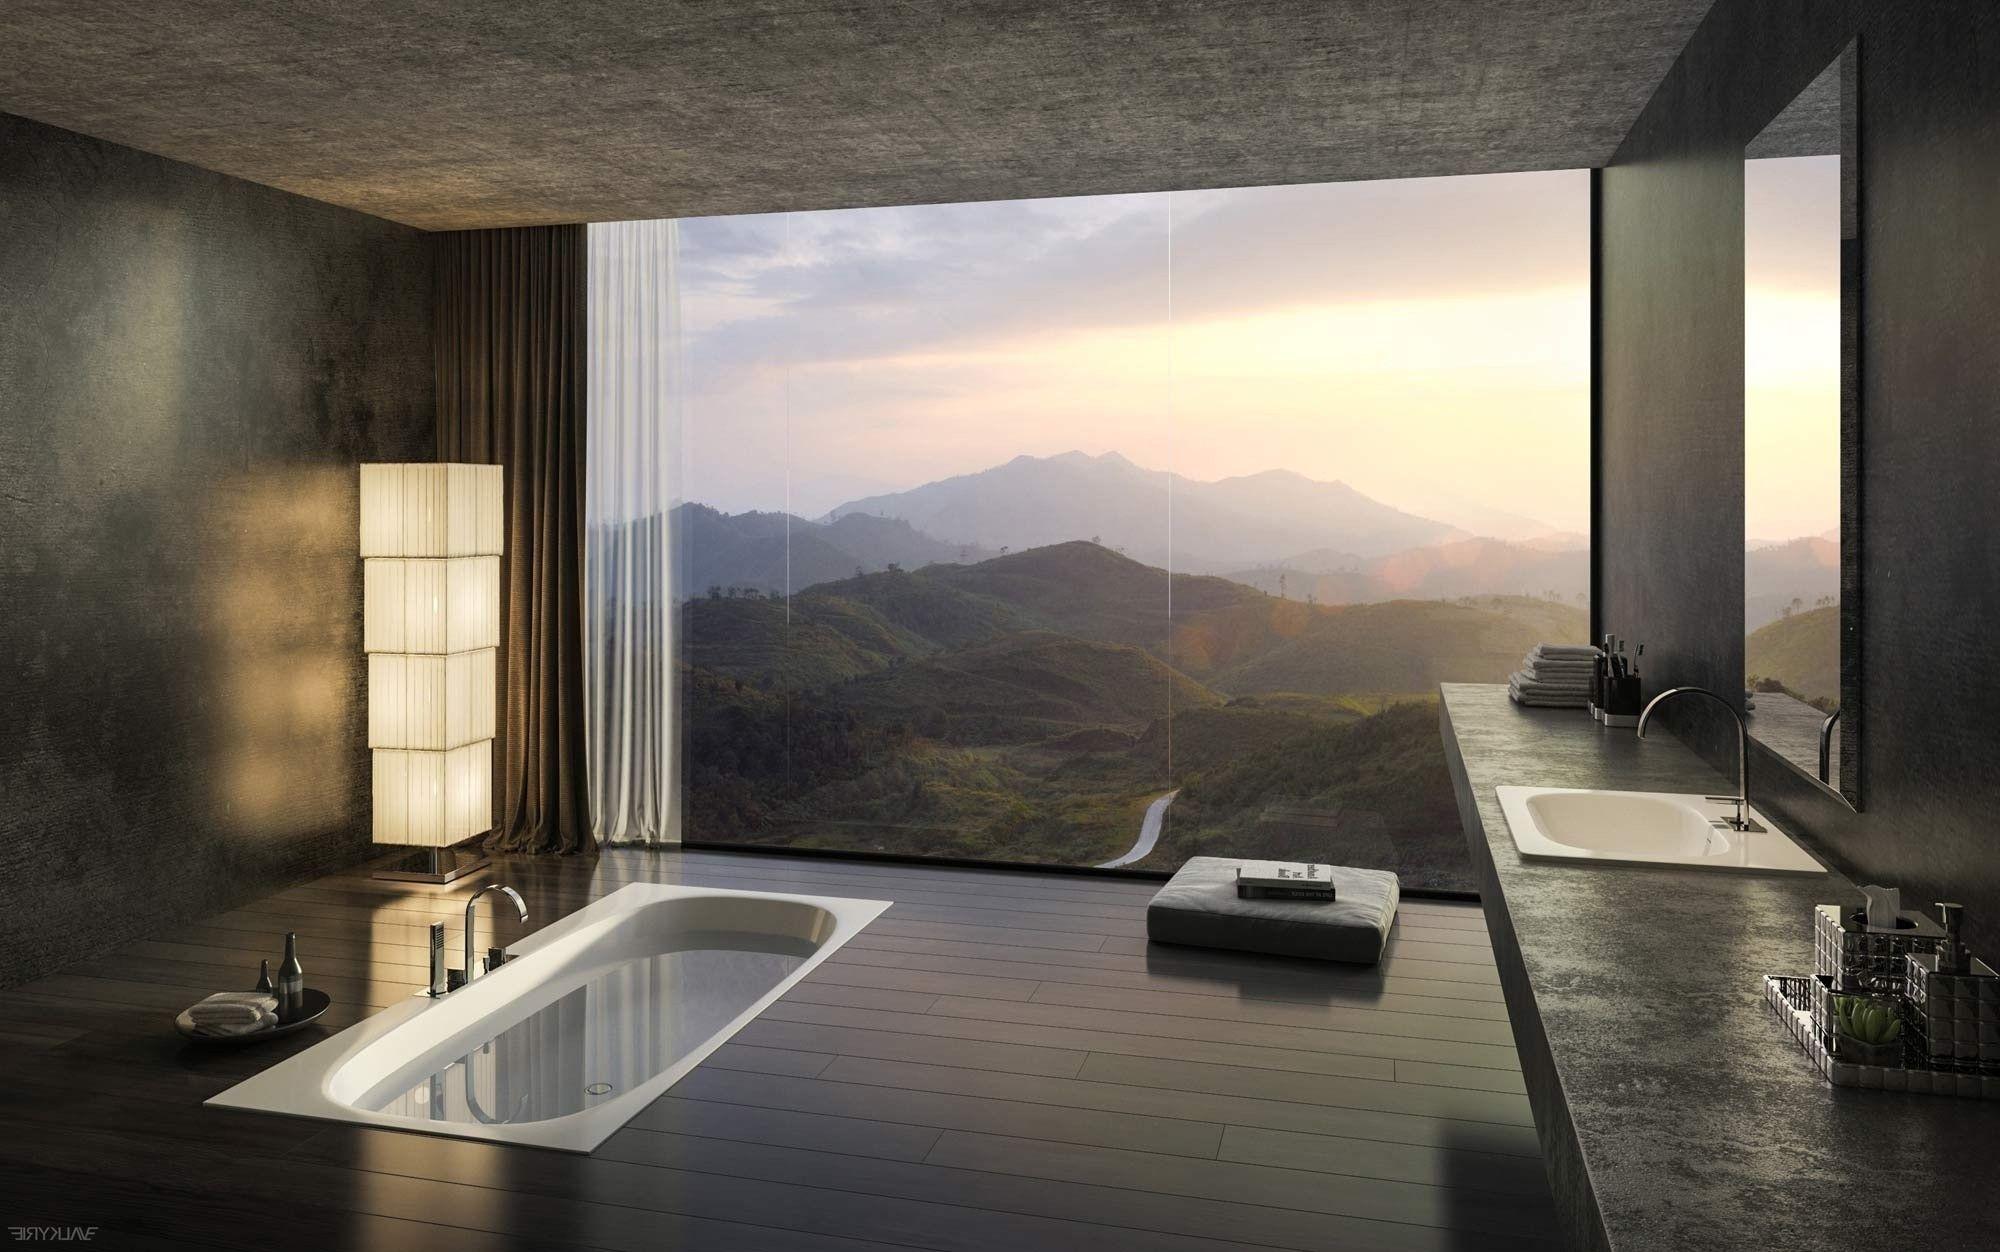 40 Stunning Luxury Bathrooms With Incredible Views Luxury Bathroom Bathroom Design Luxury Sunken Bathtub